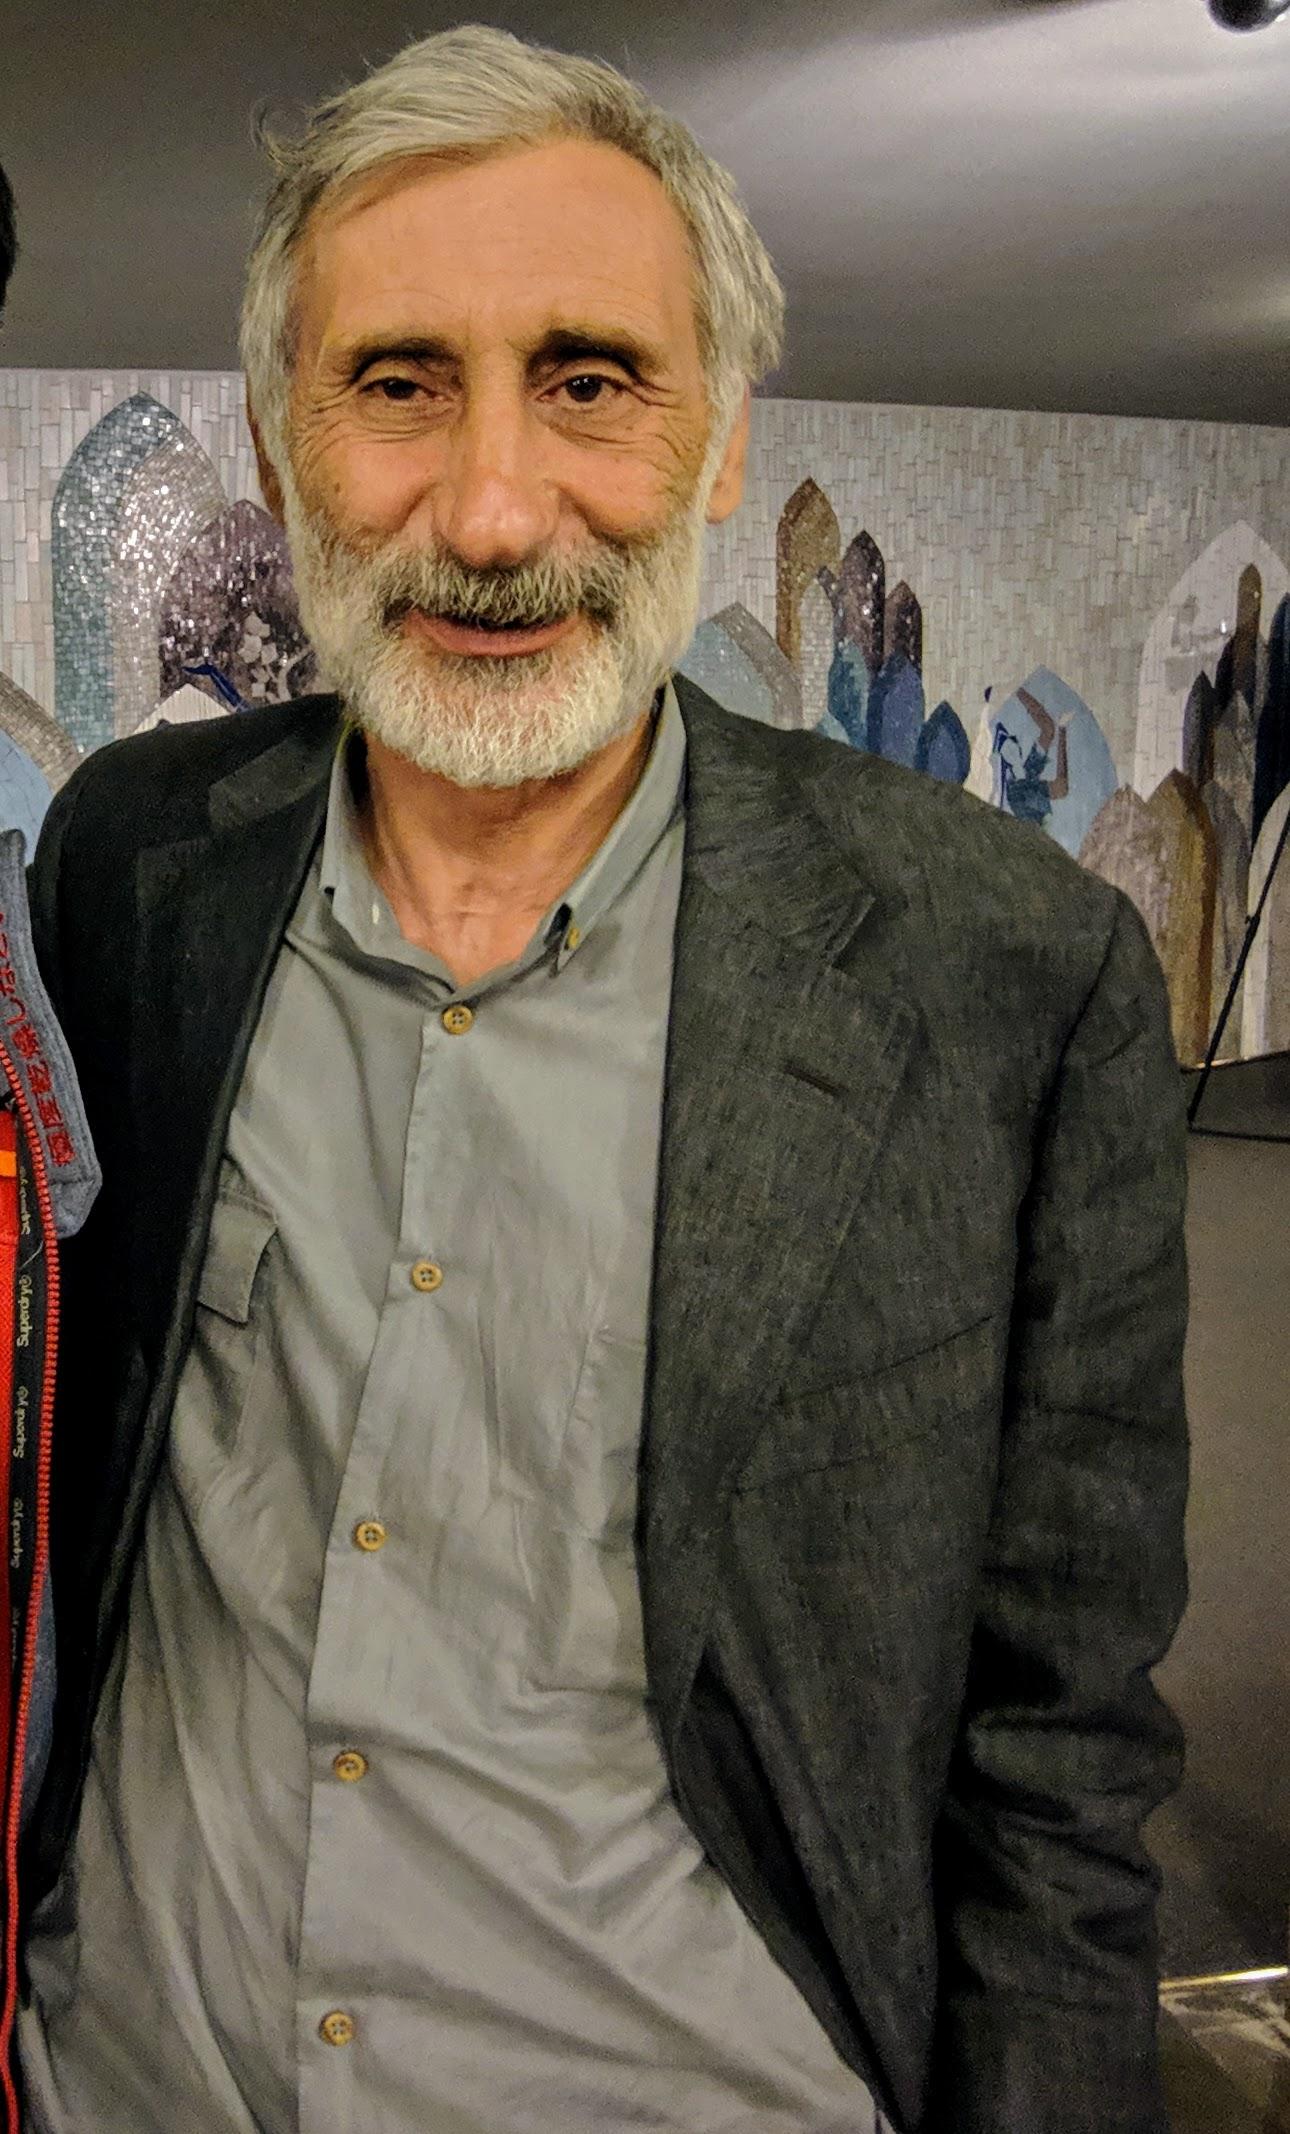 Muzaffer Ozdemir 莫札菲用土语亲切与矮夯北分享从影工作经验谈